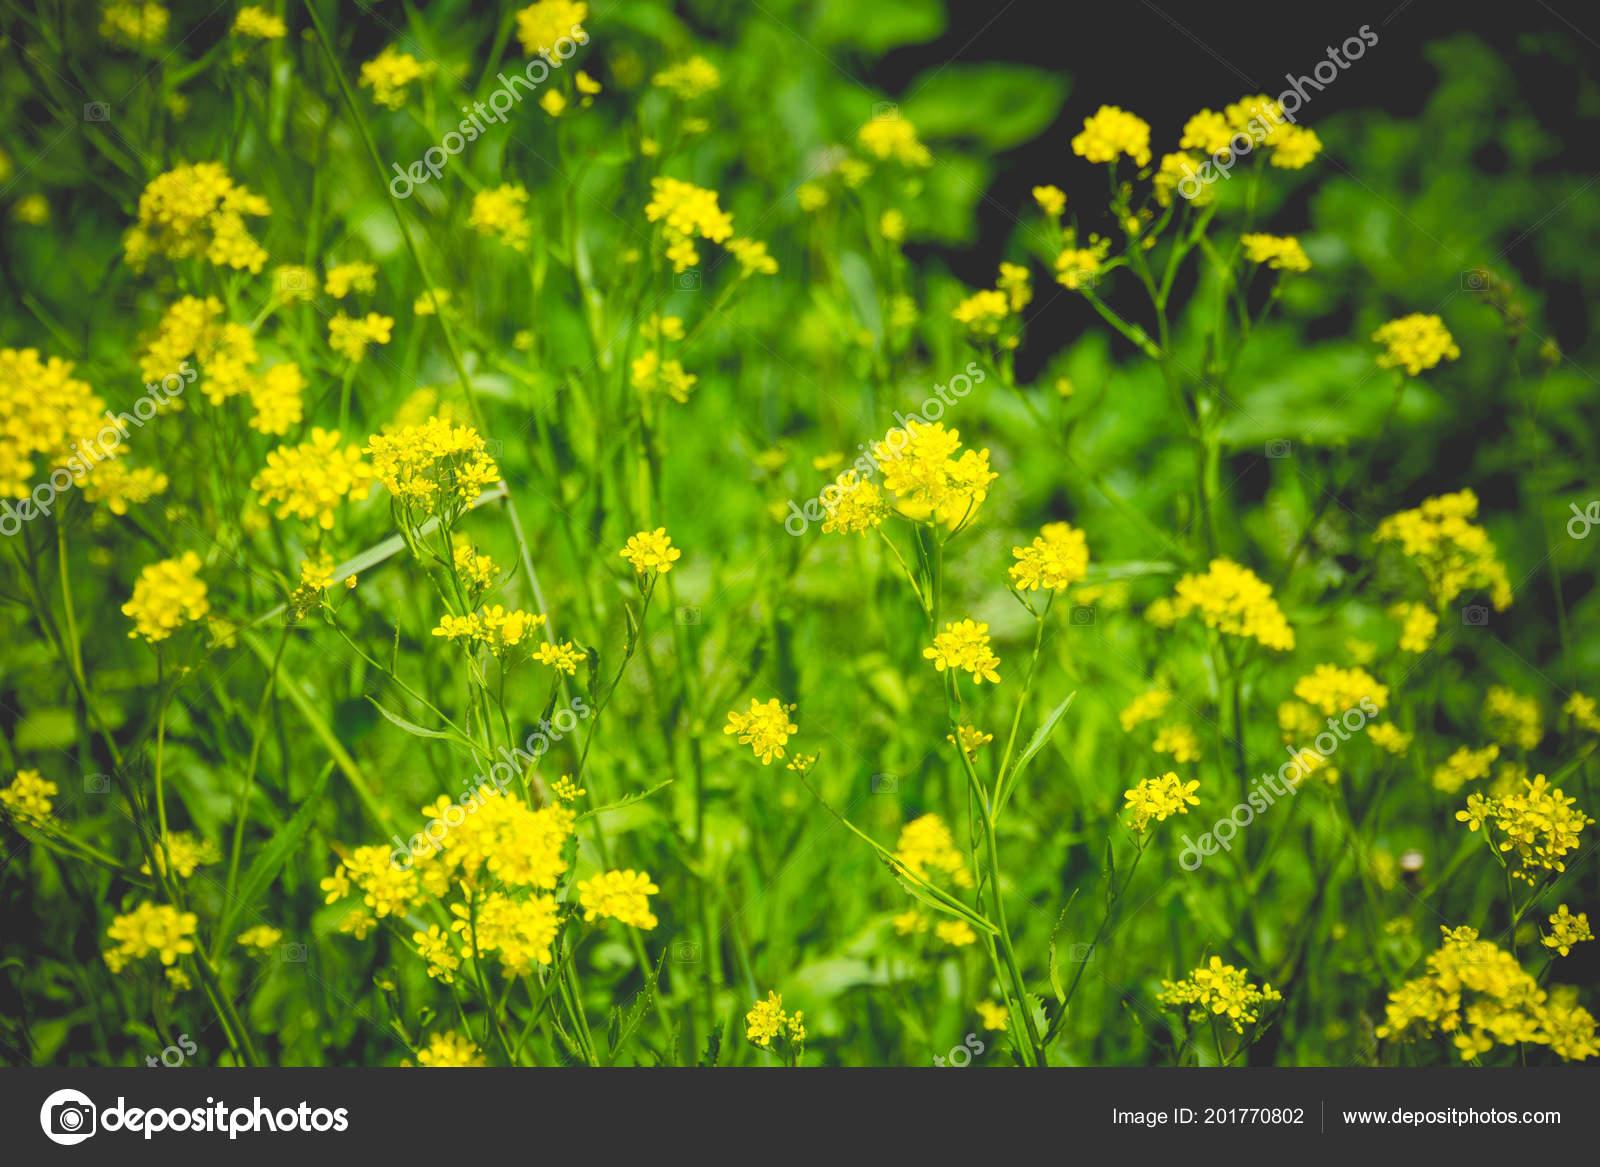 Wild yellow flowers blooming summer grass field stock photo wild yellow flowers blooming summer grass field stock photo mightylinksfo